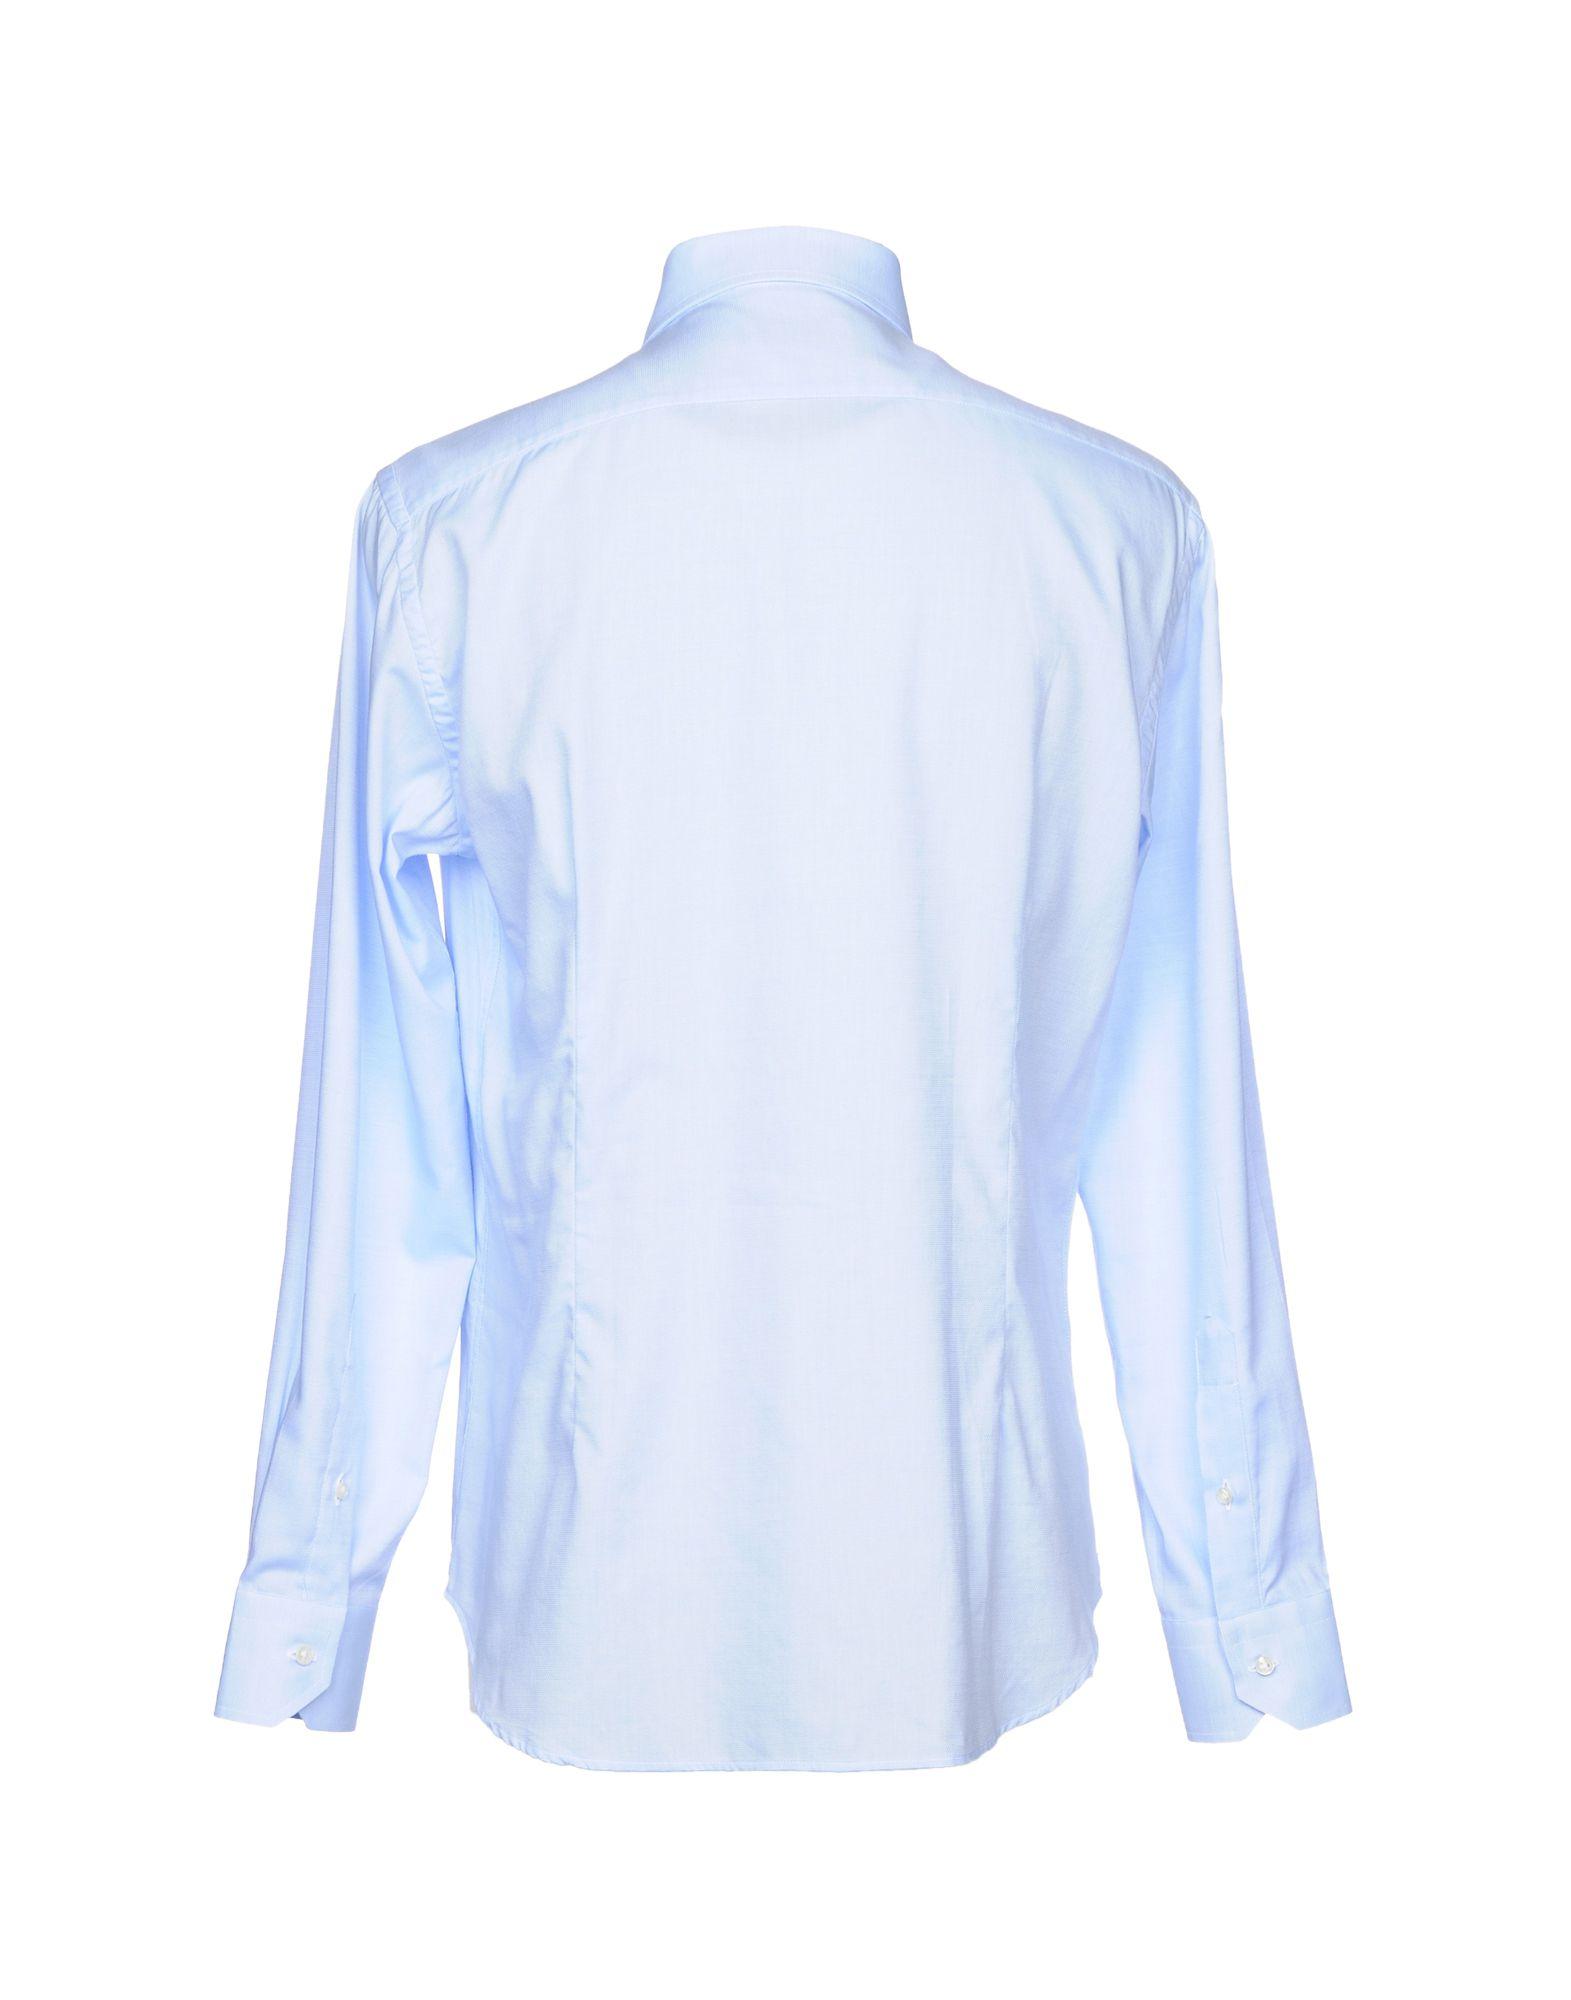 Camicia Tinta Briodue Unita Briodue Tinta Uomo - 38755031NQ 531040